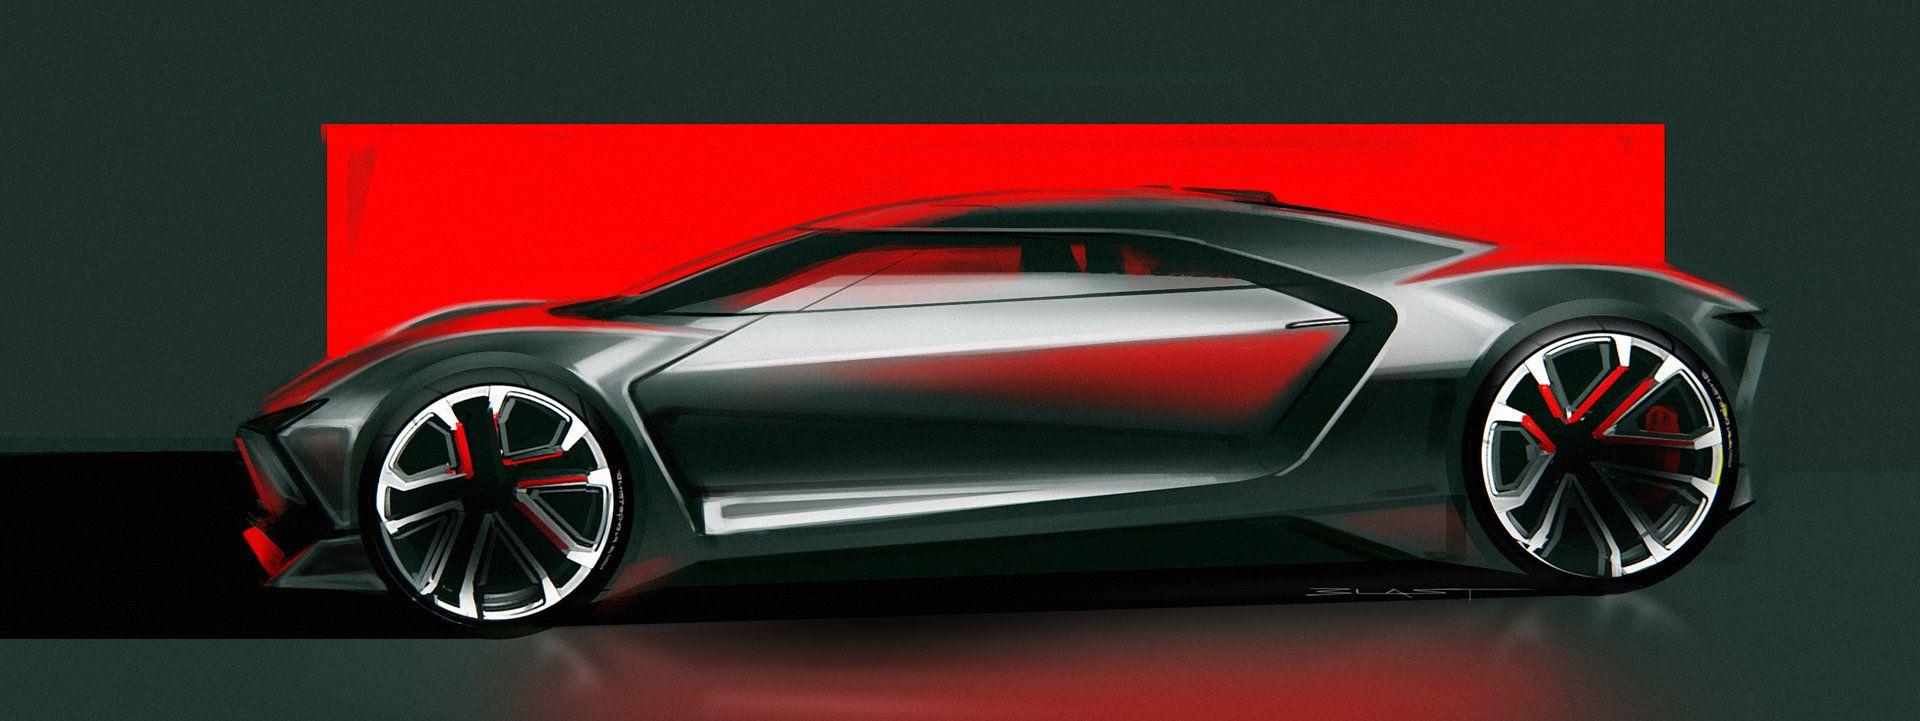 ArtStation - Mid-Engine Car Sketch, Benjamin Last